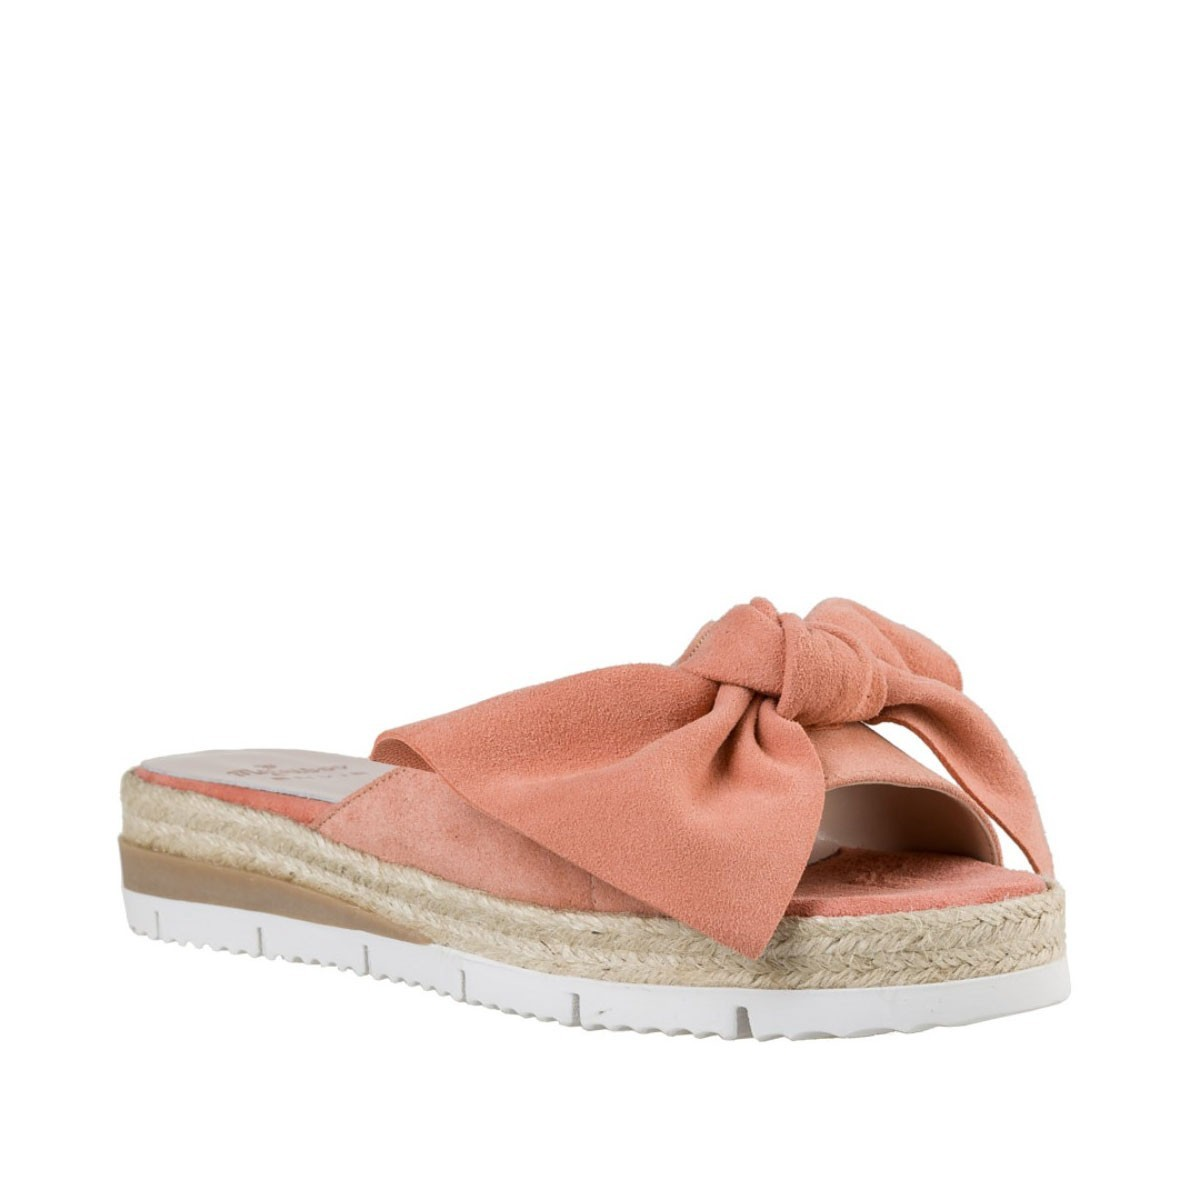 BagiotaShoes Mairiboo by Envie Shoes Γυναικείες Παντόφλες M03-05914 Ροζ  Mairiboo M03-05914 Ροζ d9f5563330f